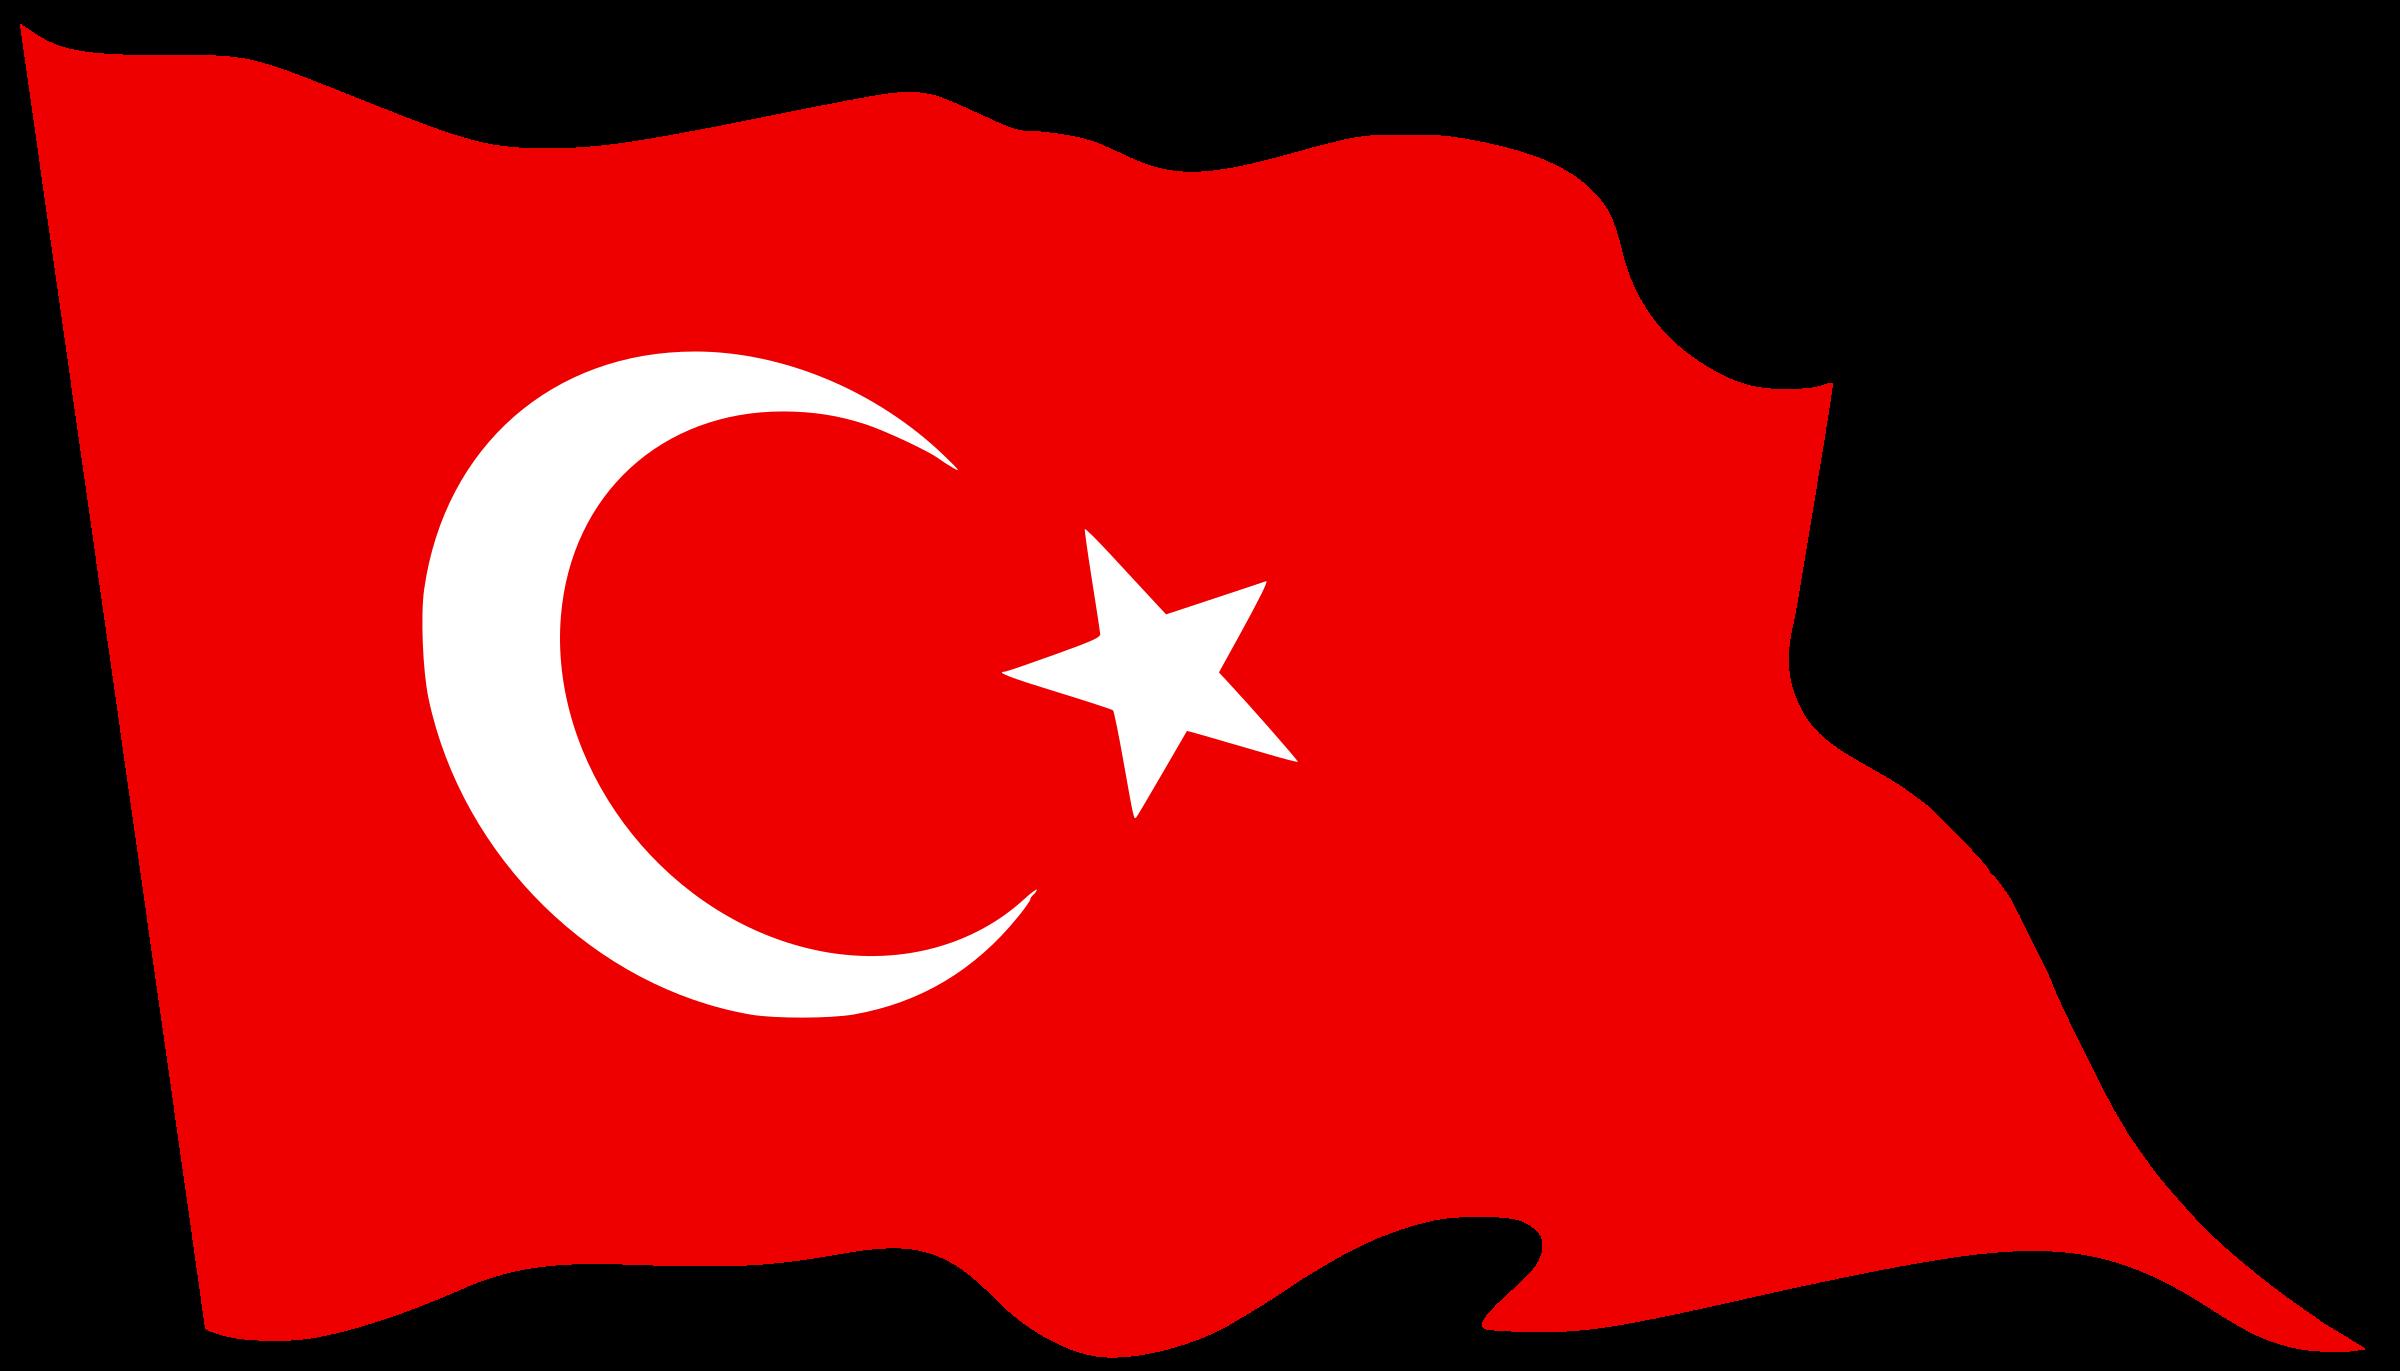 Free Turkish Flag Png, Download Free Clip Art, Free Clip Art.